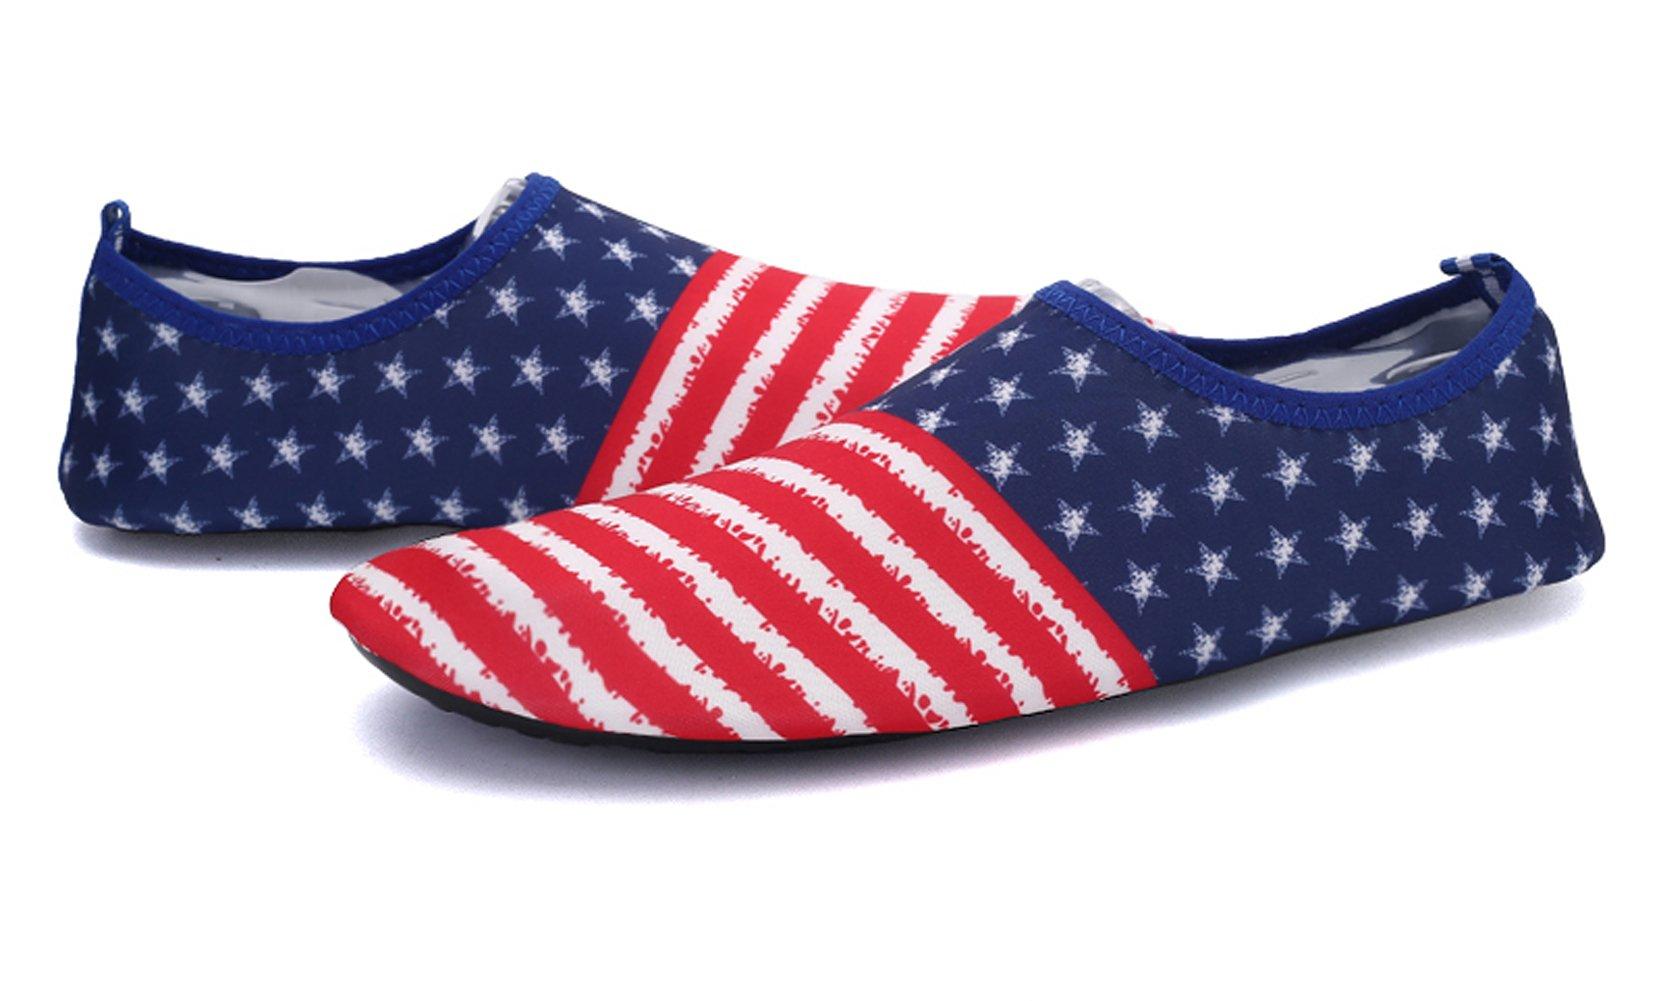 Demetory Unisex Outdoor Water Shoes Neoprene Lightweight Quick-Dry Barefoot Aque Socks Swim, Walking, Yoga, Beach, Water Park by Demetory (Image #1)